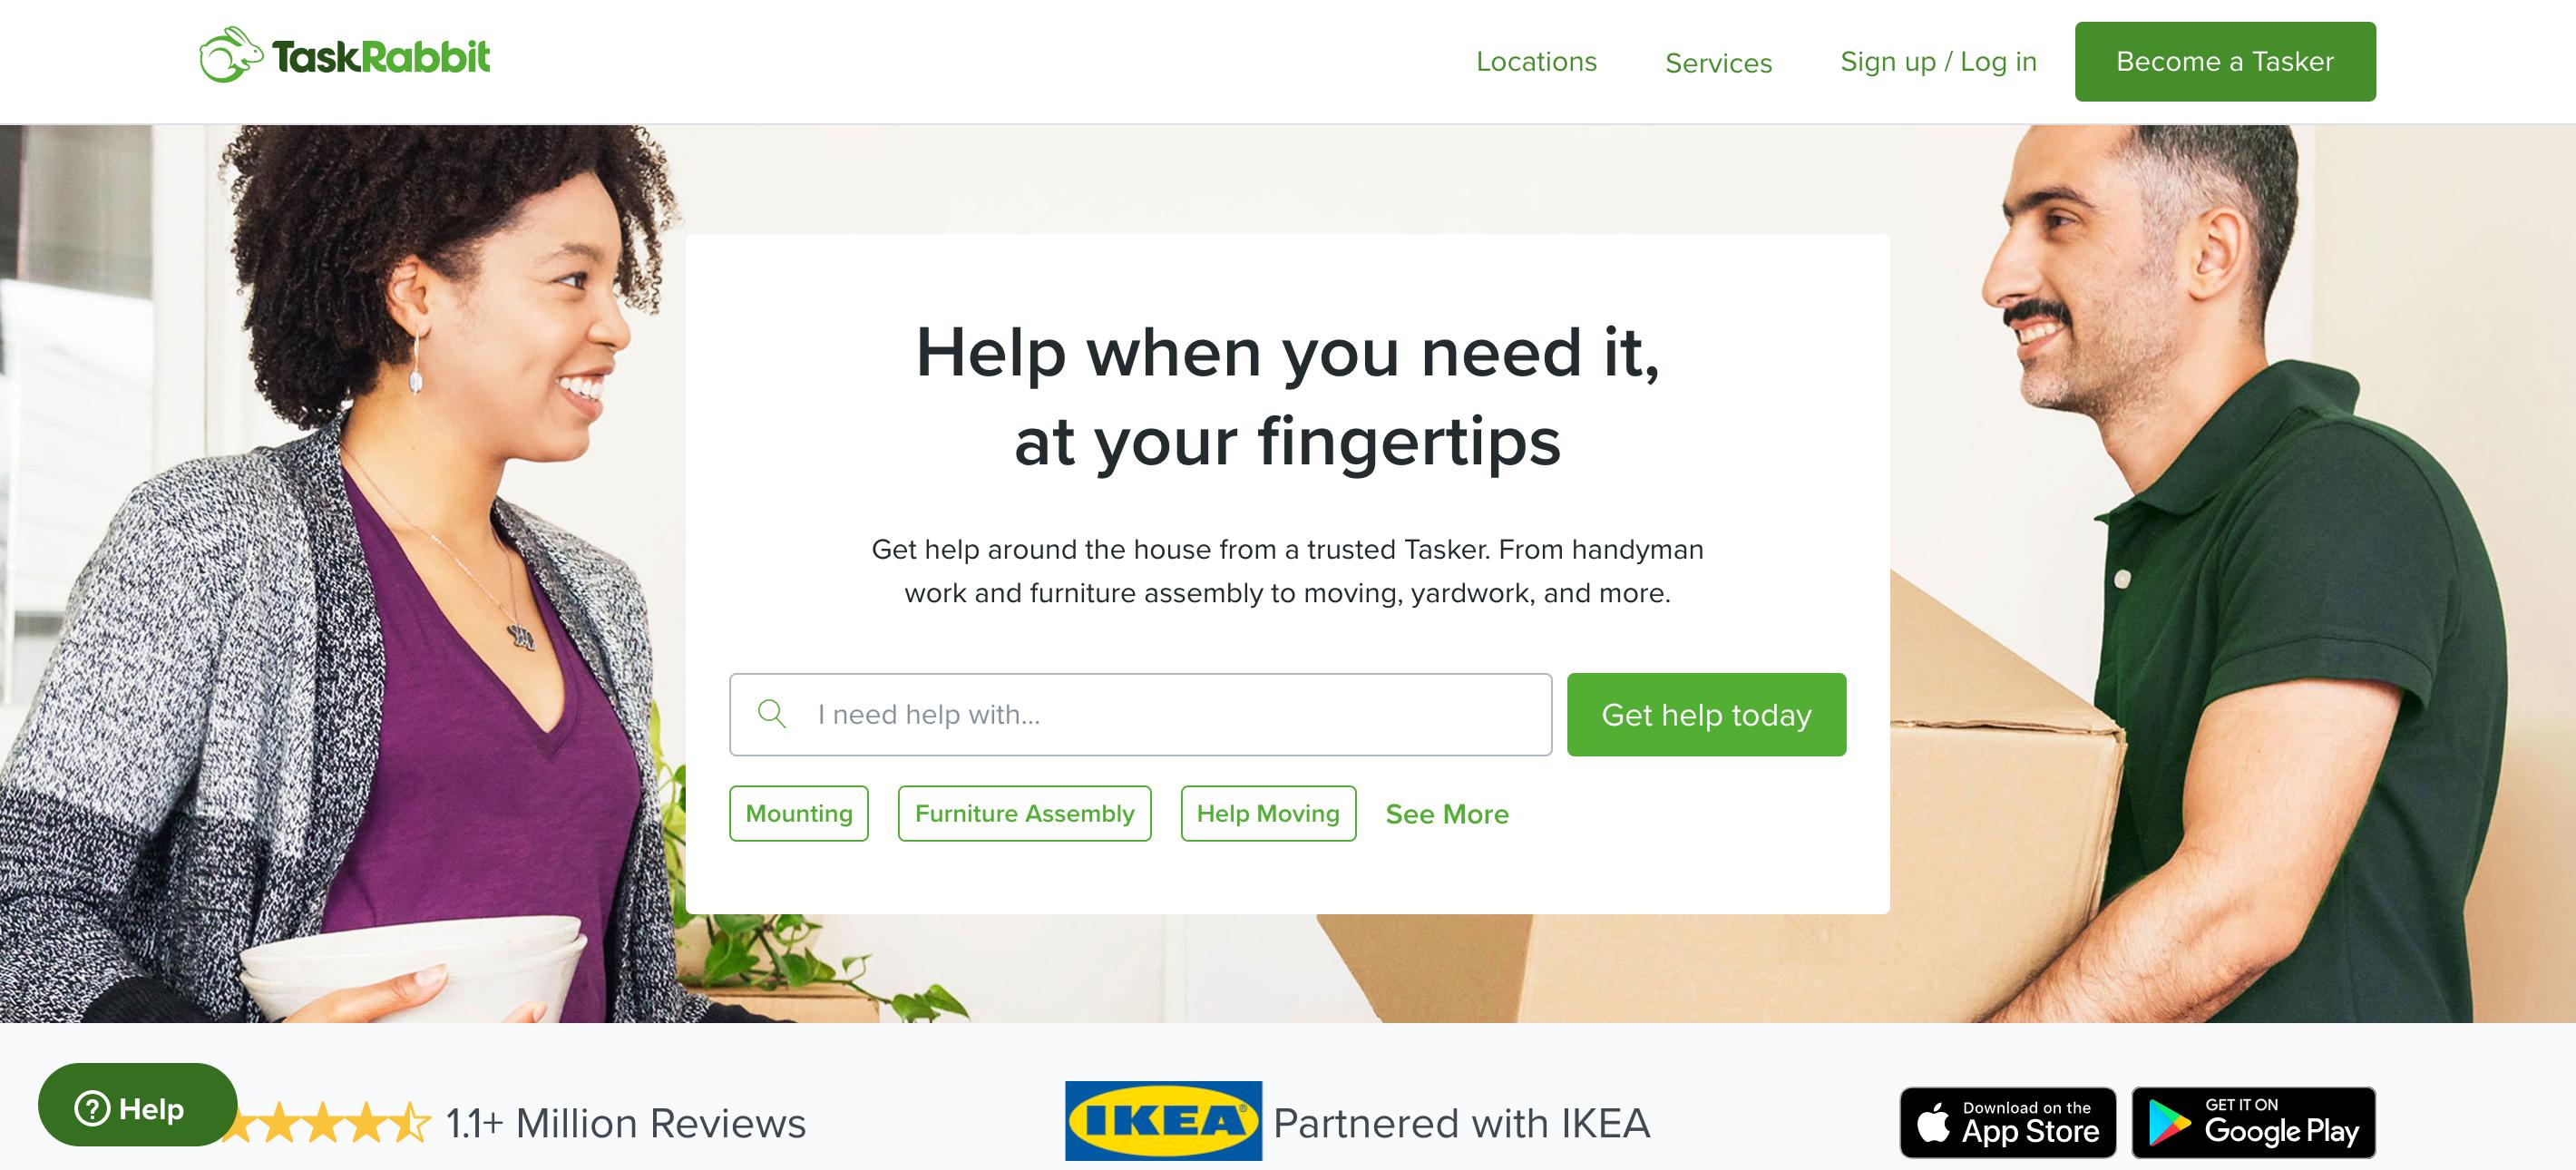 Cleaning services on TaskRabbit